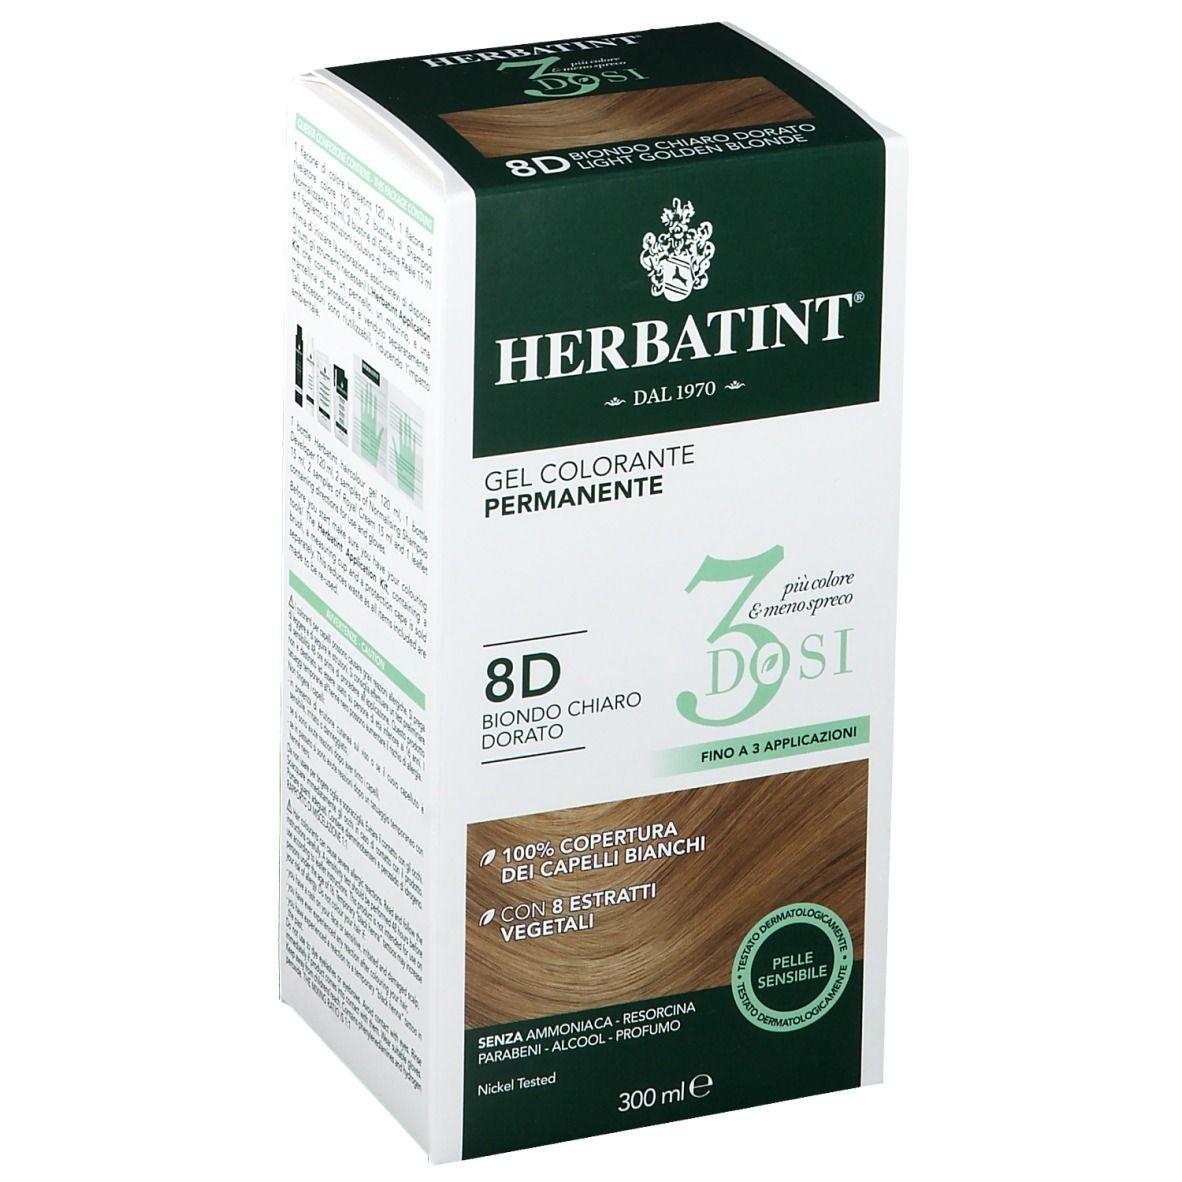 Image of HERBATINT® 3 Dosi 8D Helles Goldblond